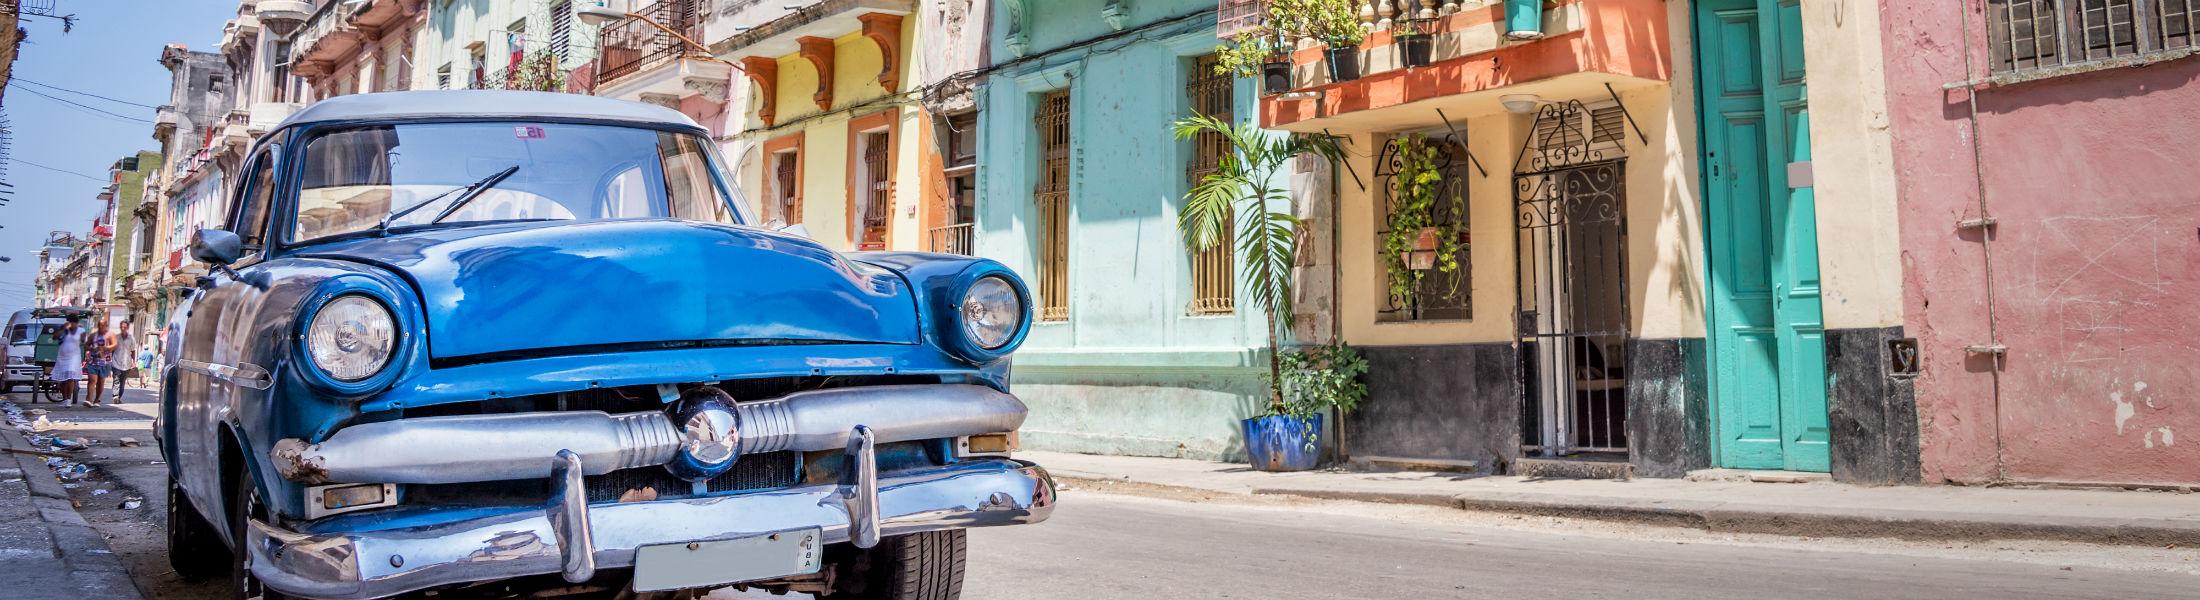 Classic American car in Havana Cuba